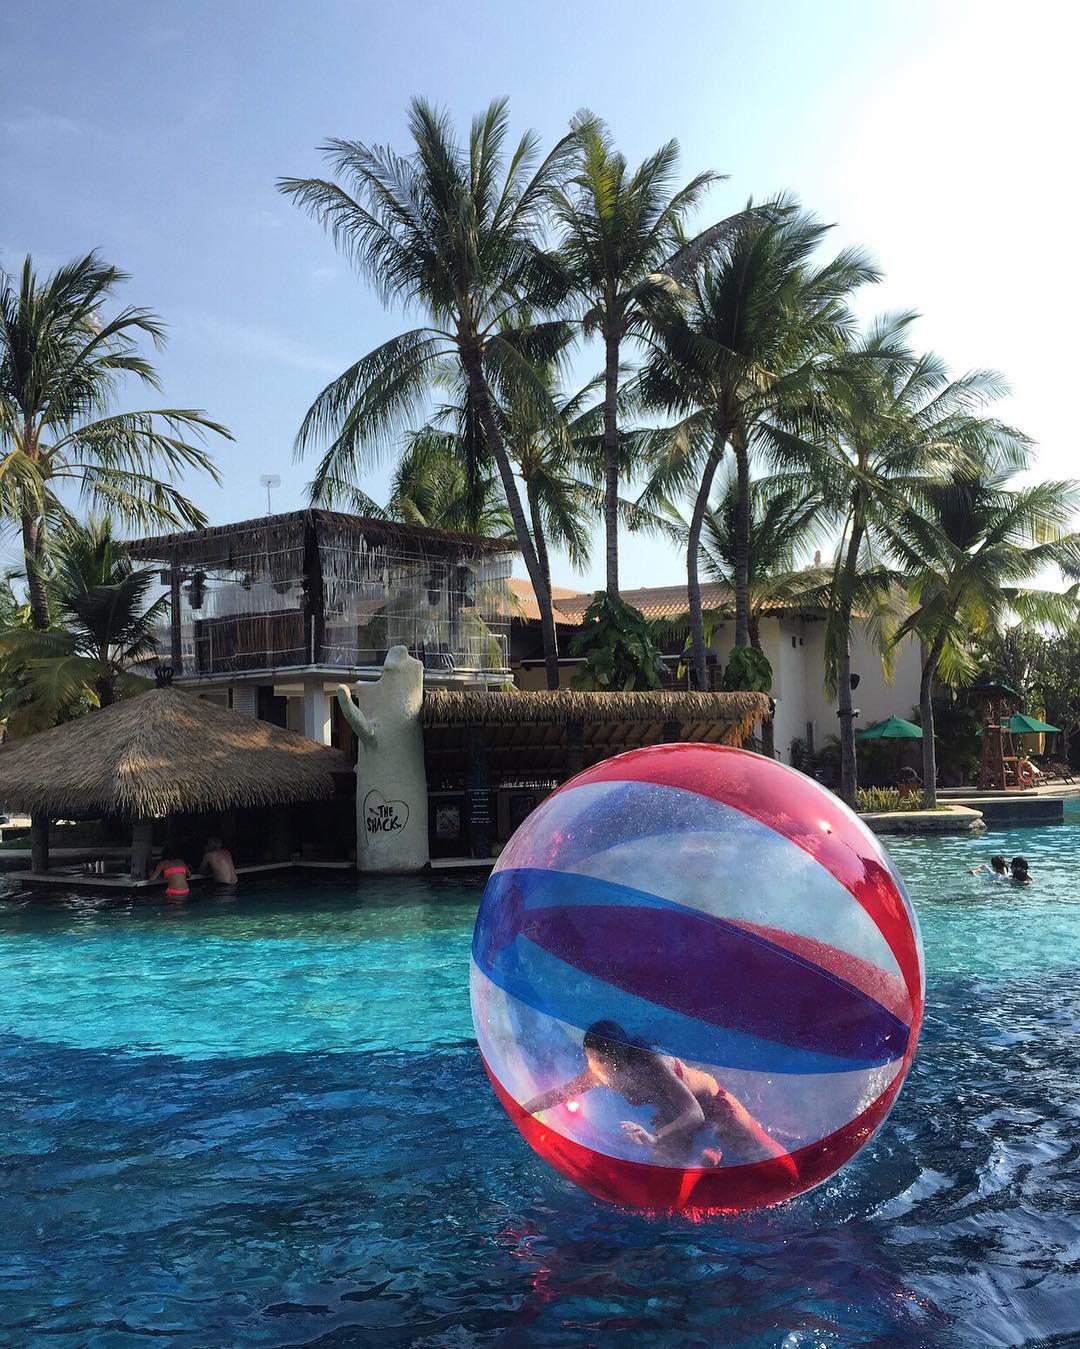 bali luxury hotels - hard rock hotel bali pool